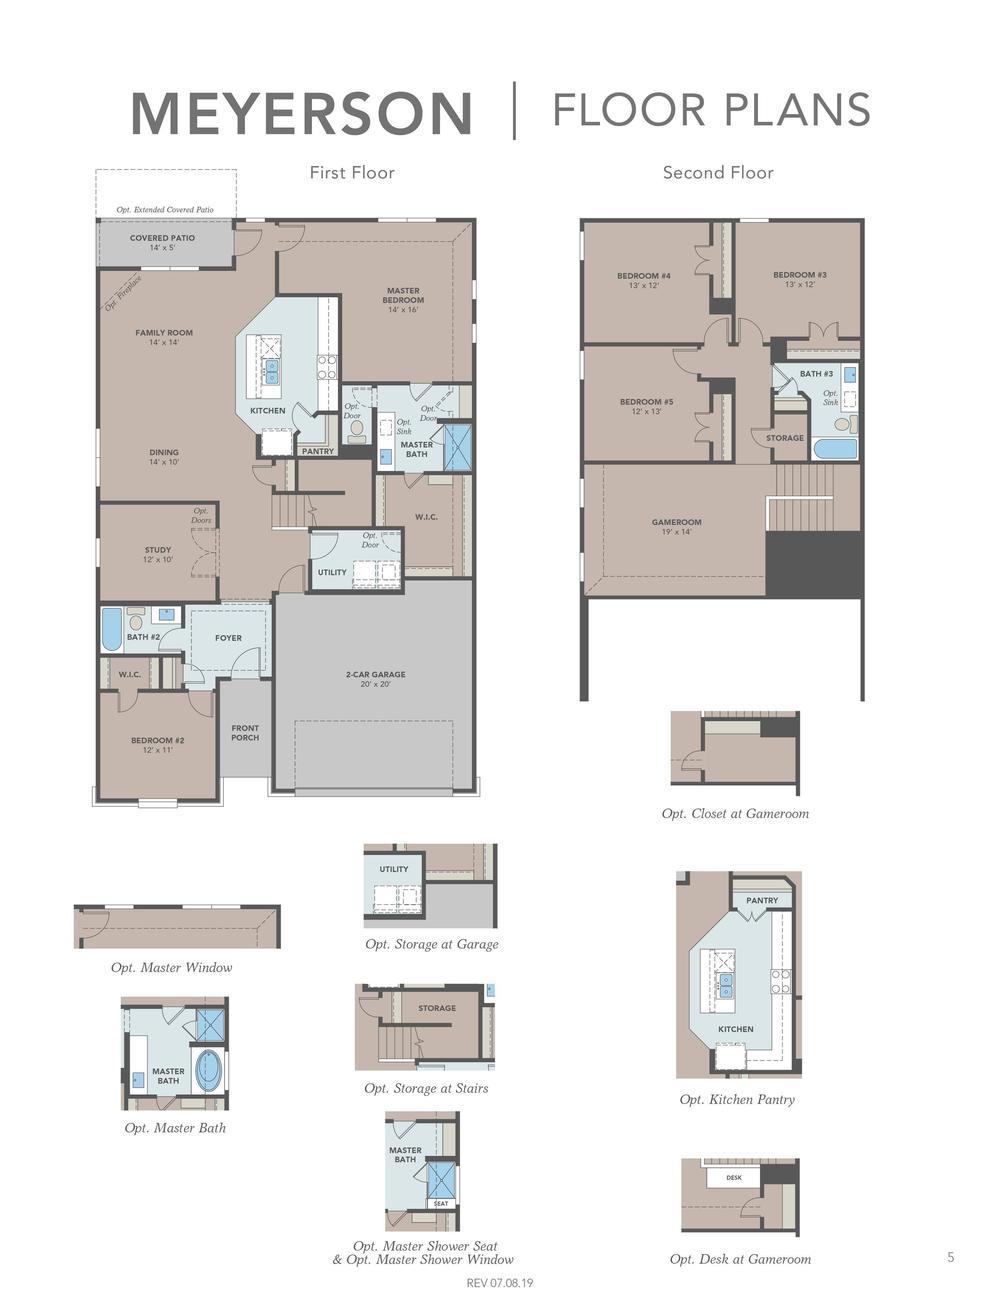 Meyerson Floor Plans